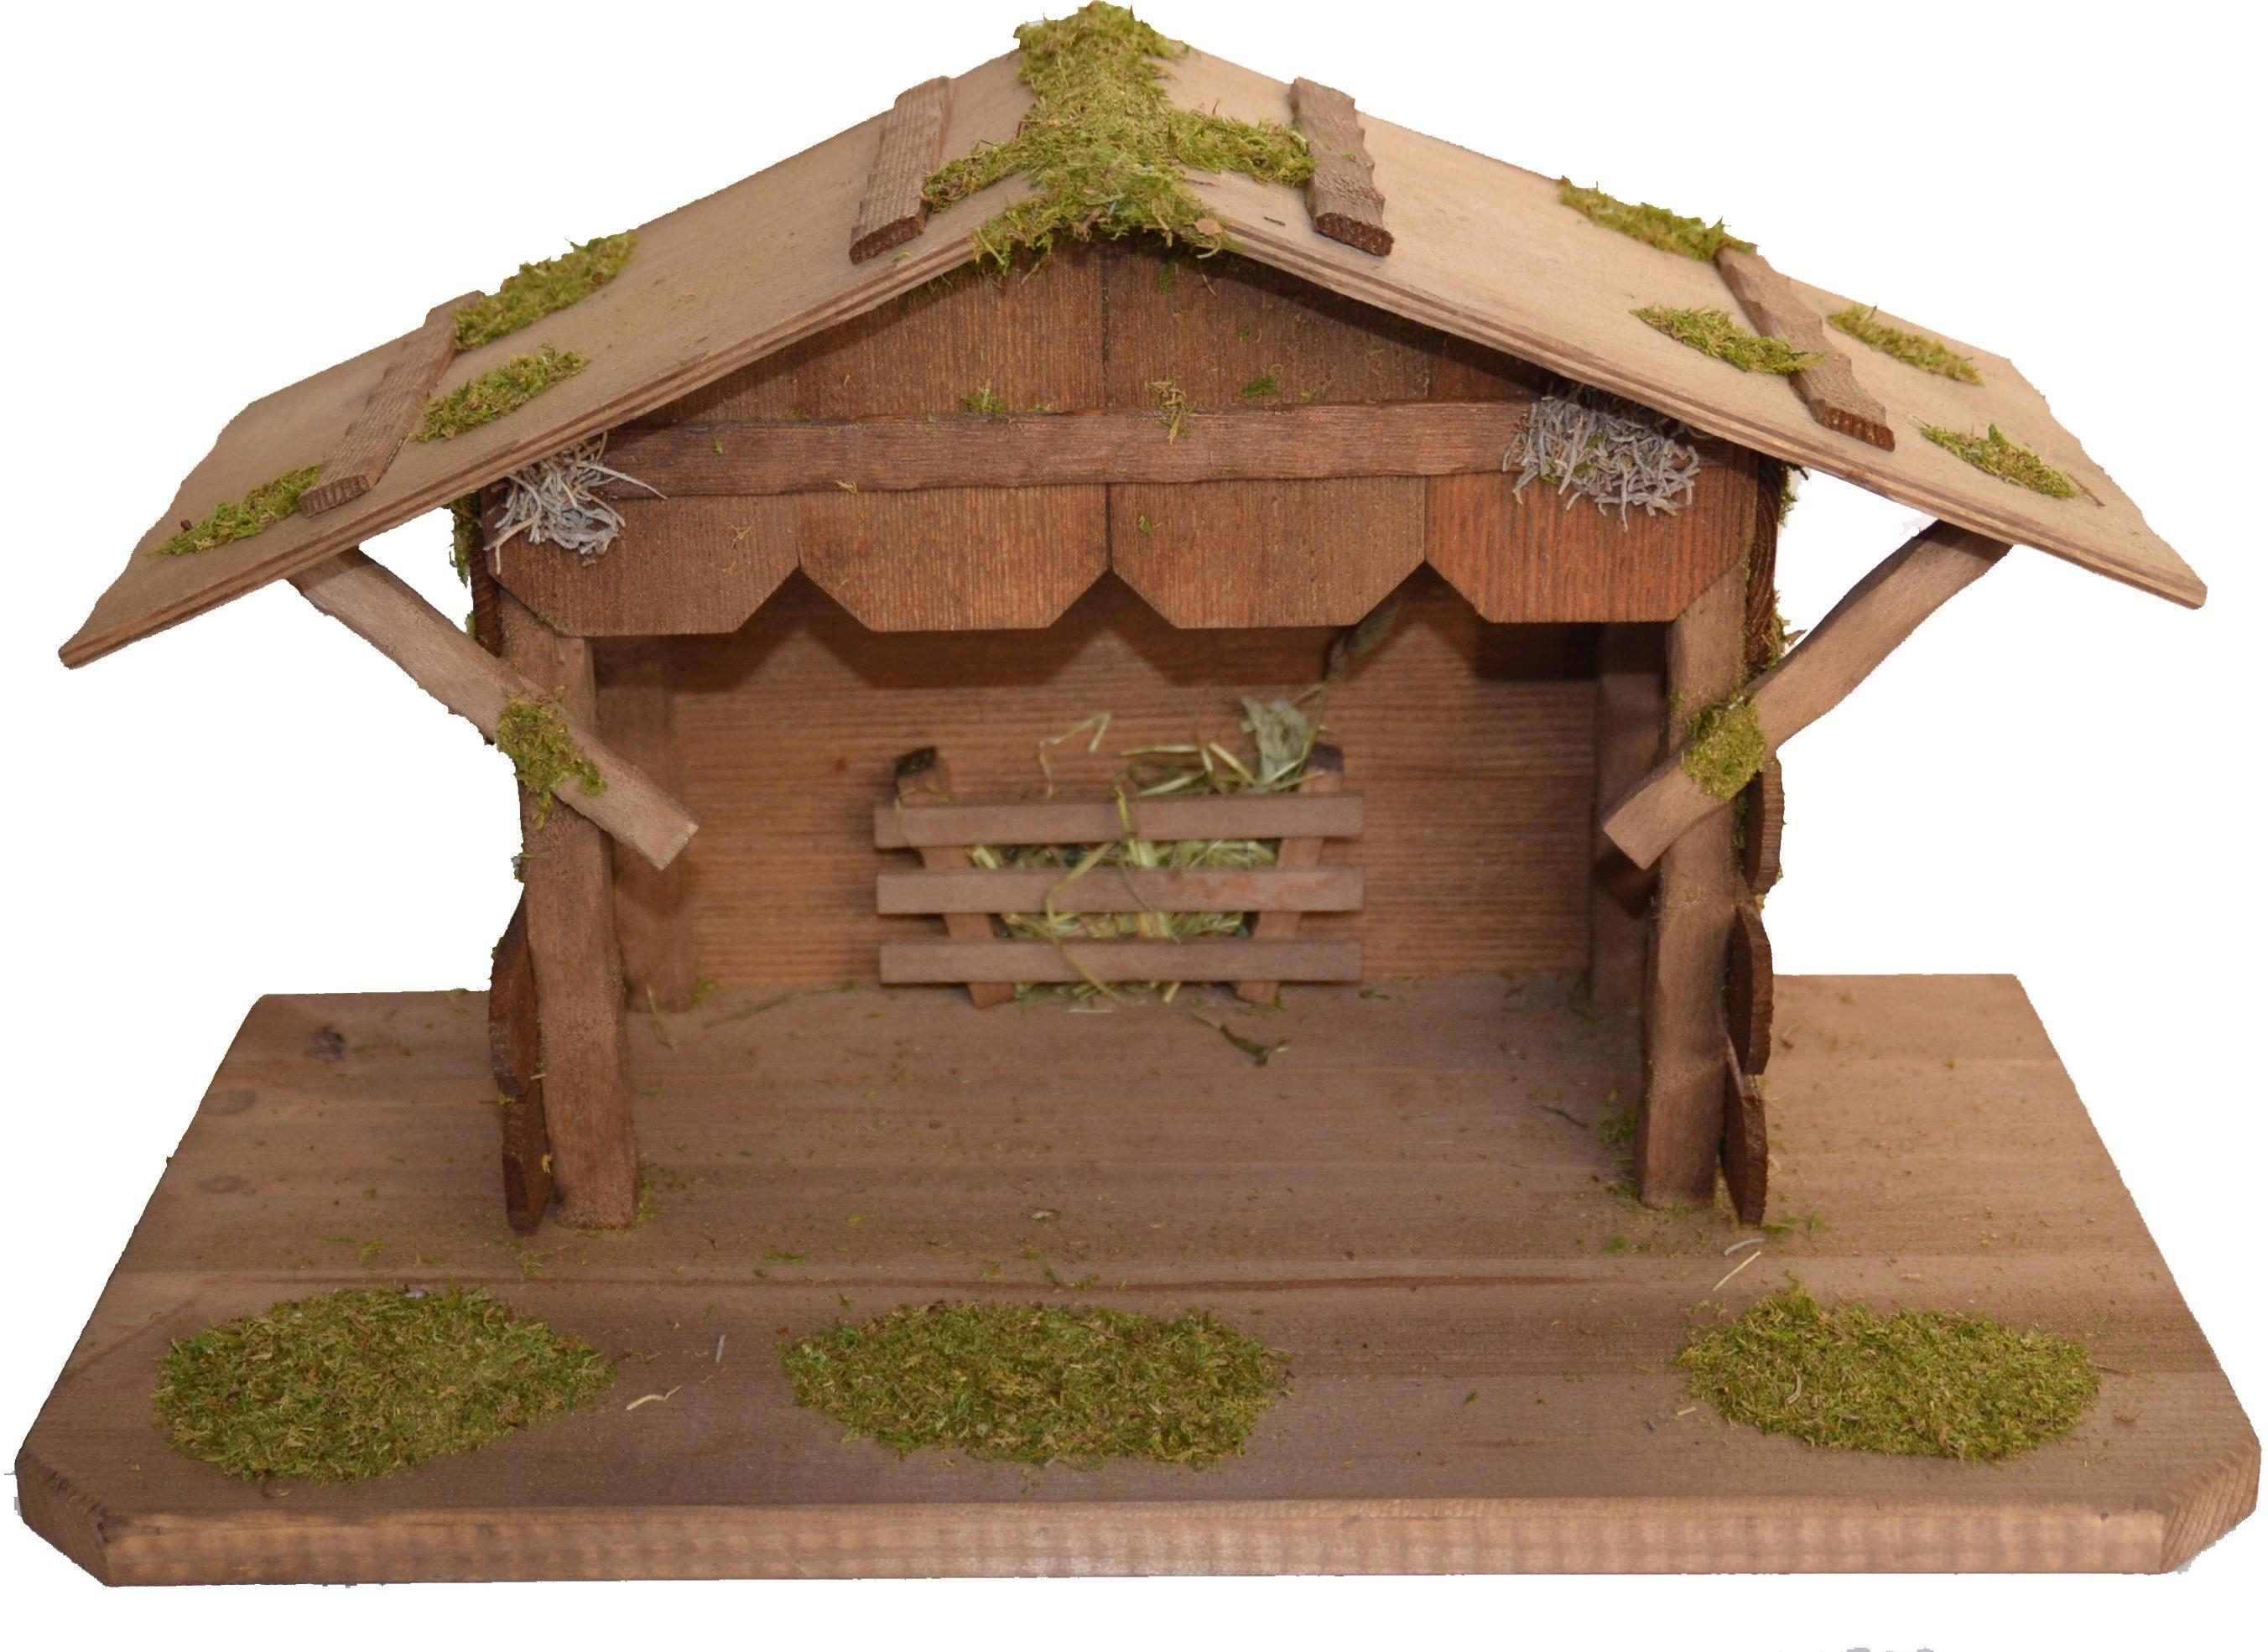 Alfred Kolbe kribbe Kerststal tot 12 cm figuren Echt hout (1-delig) nu online kopen bij OTTO